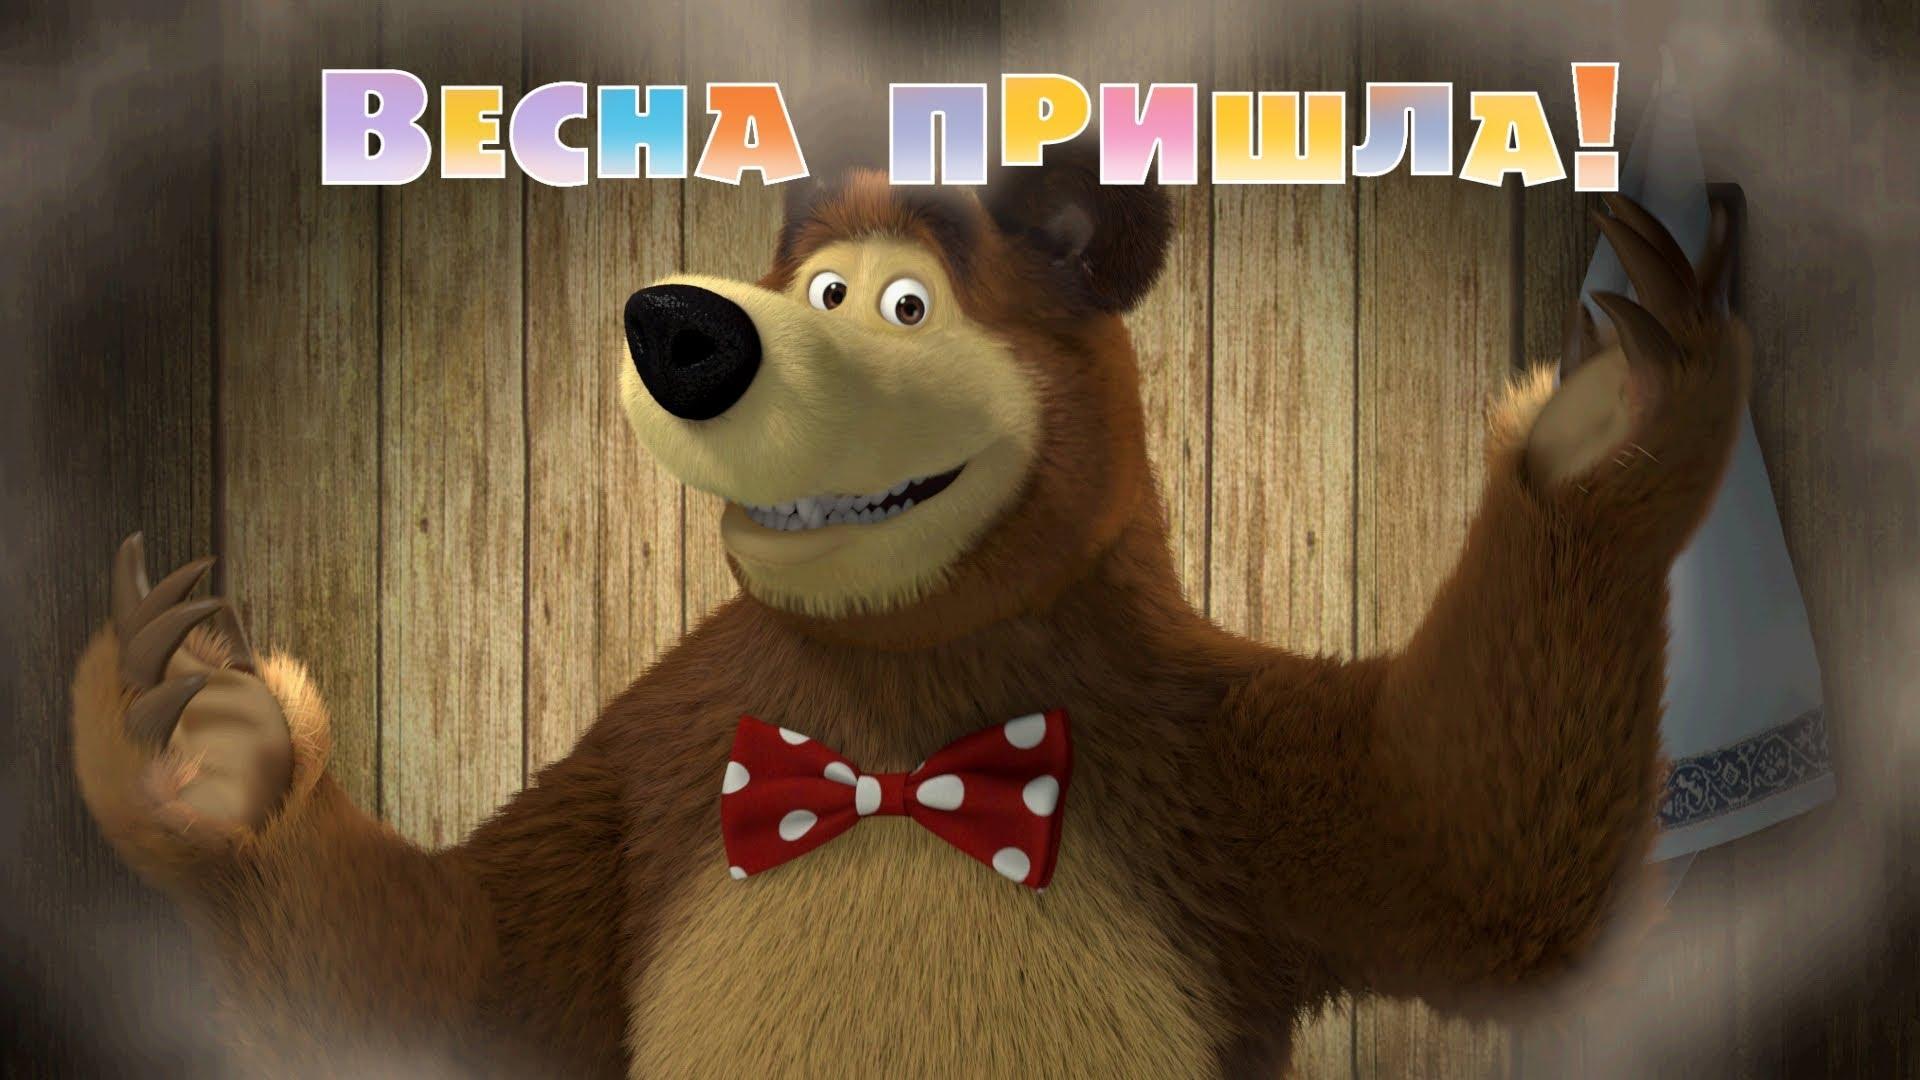 7 Серия. Маша и Медведь — Весна пришла